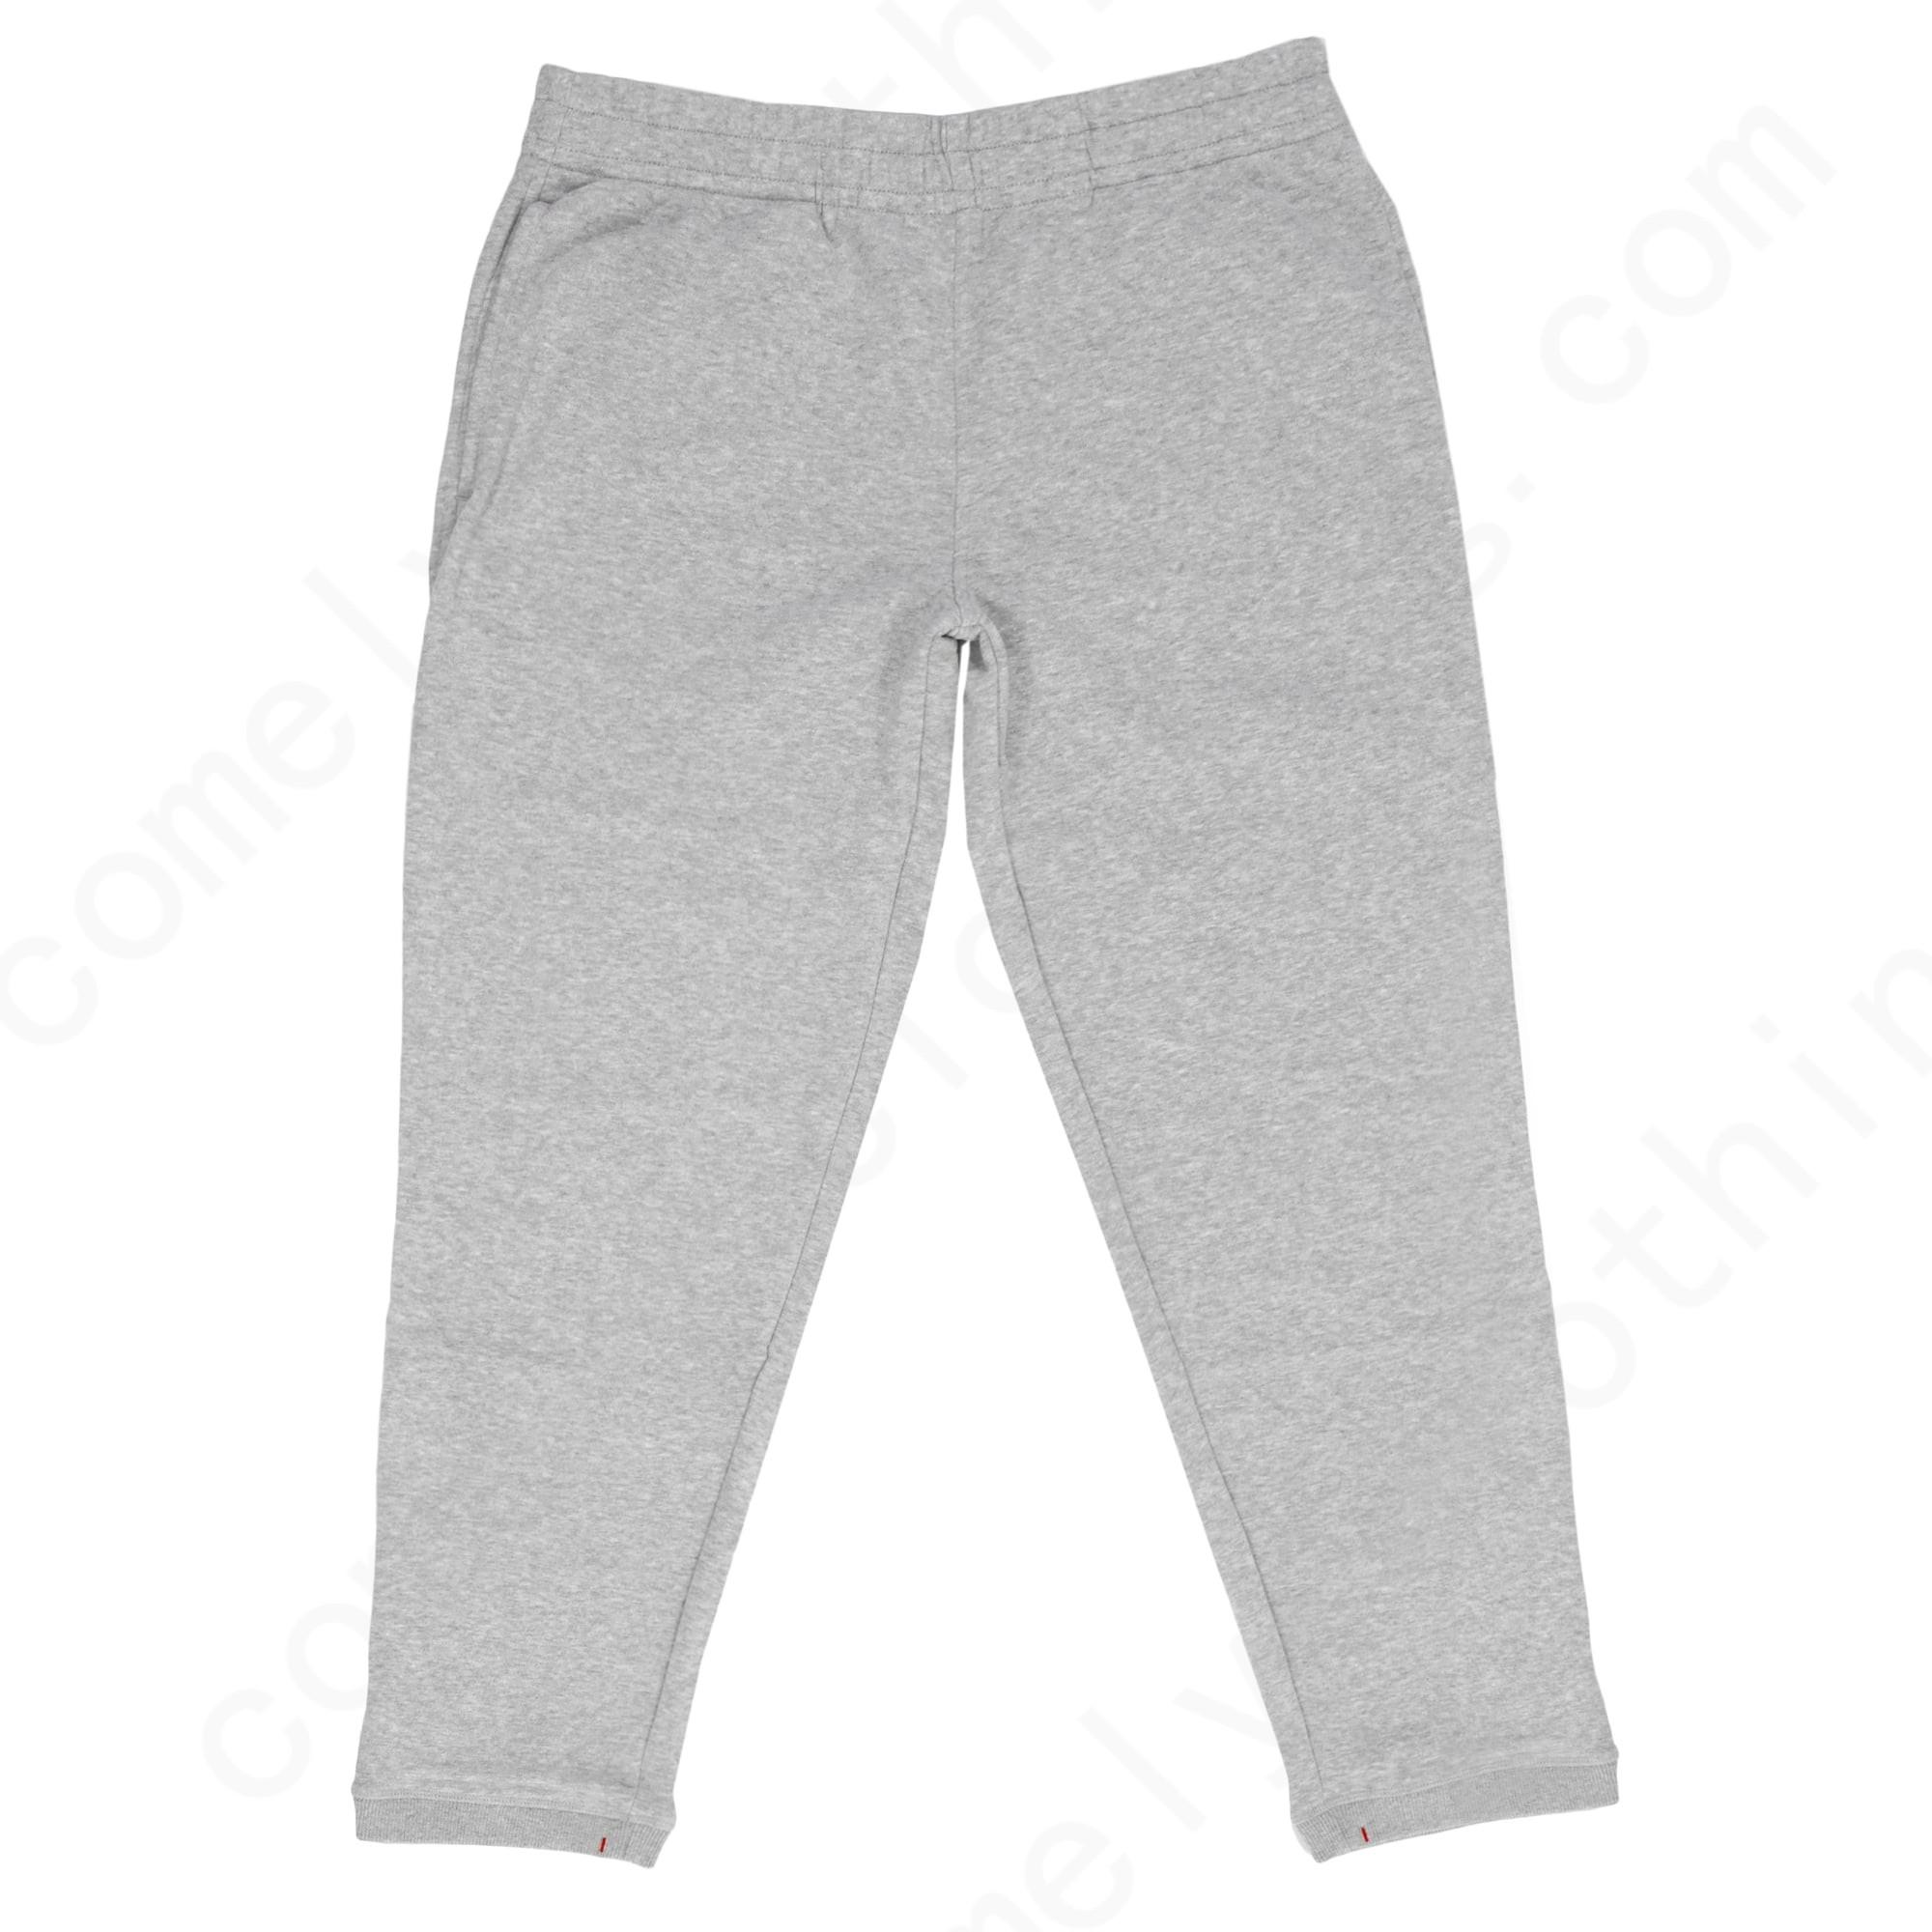 Wolsey Brushed Soft Handle Grey Sweatpants Wm20M16 Mens - Wolsey Brushed Soft Handle Grey Sweatpants Wm20M16 Mens